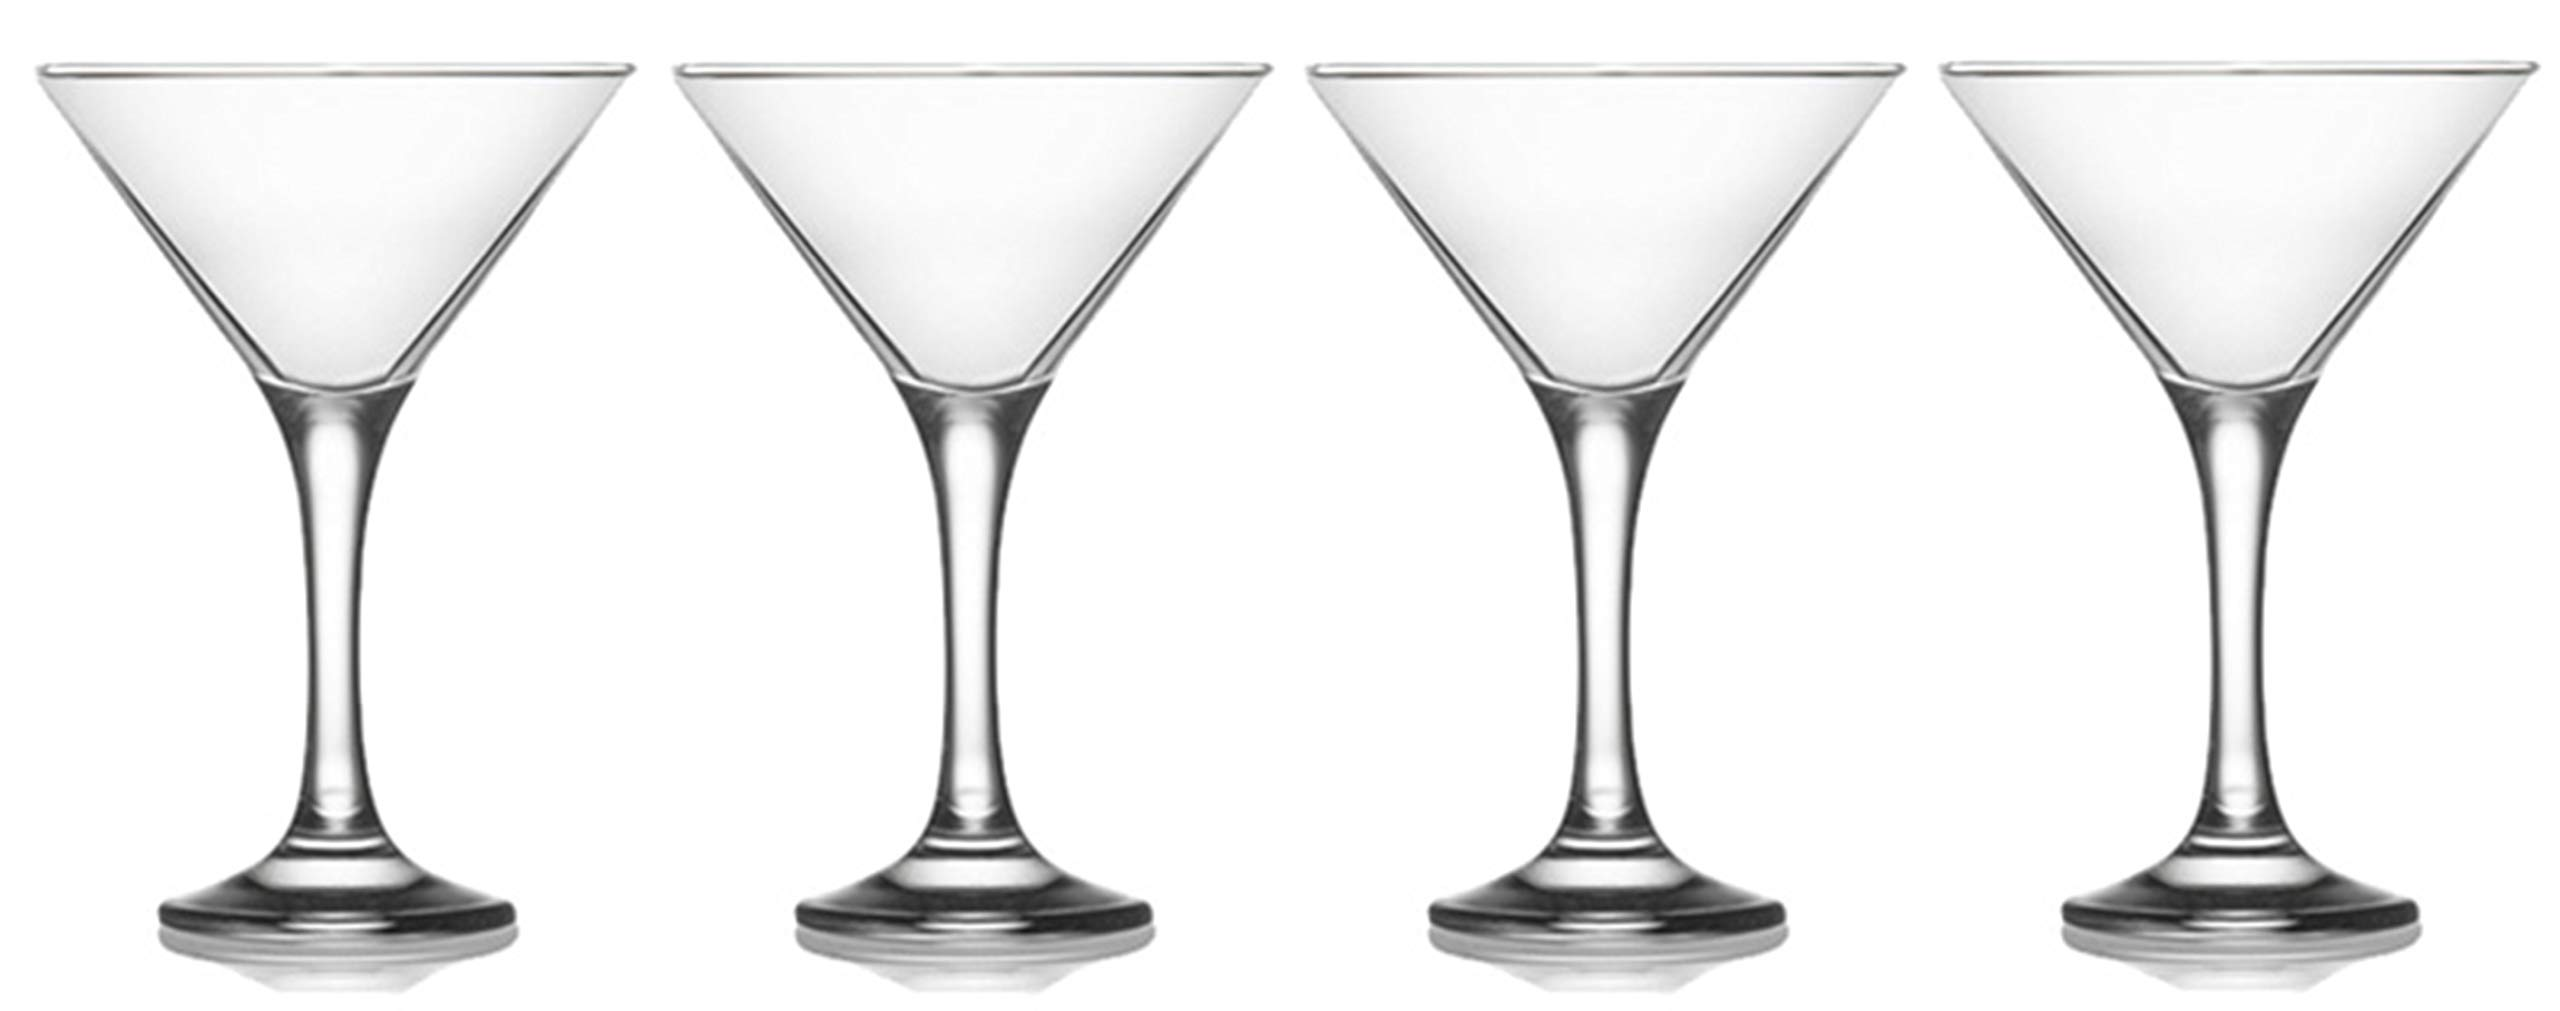 Epure Milano Collection 4 Piece Glass Set (Martini Glass (6 oz))